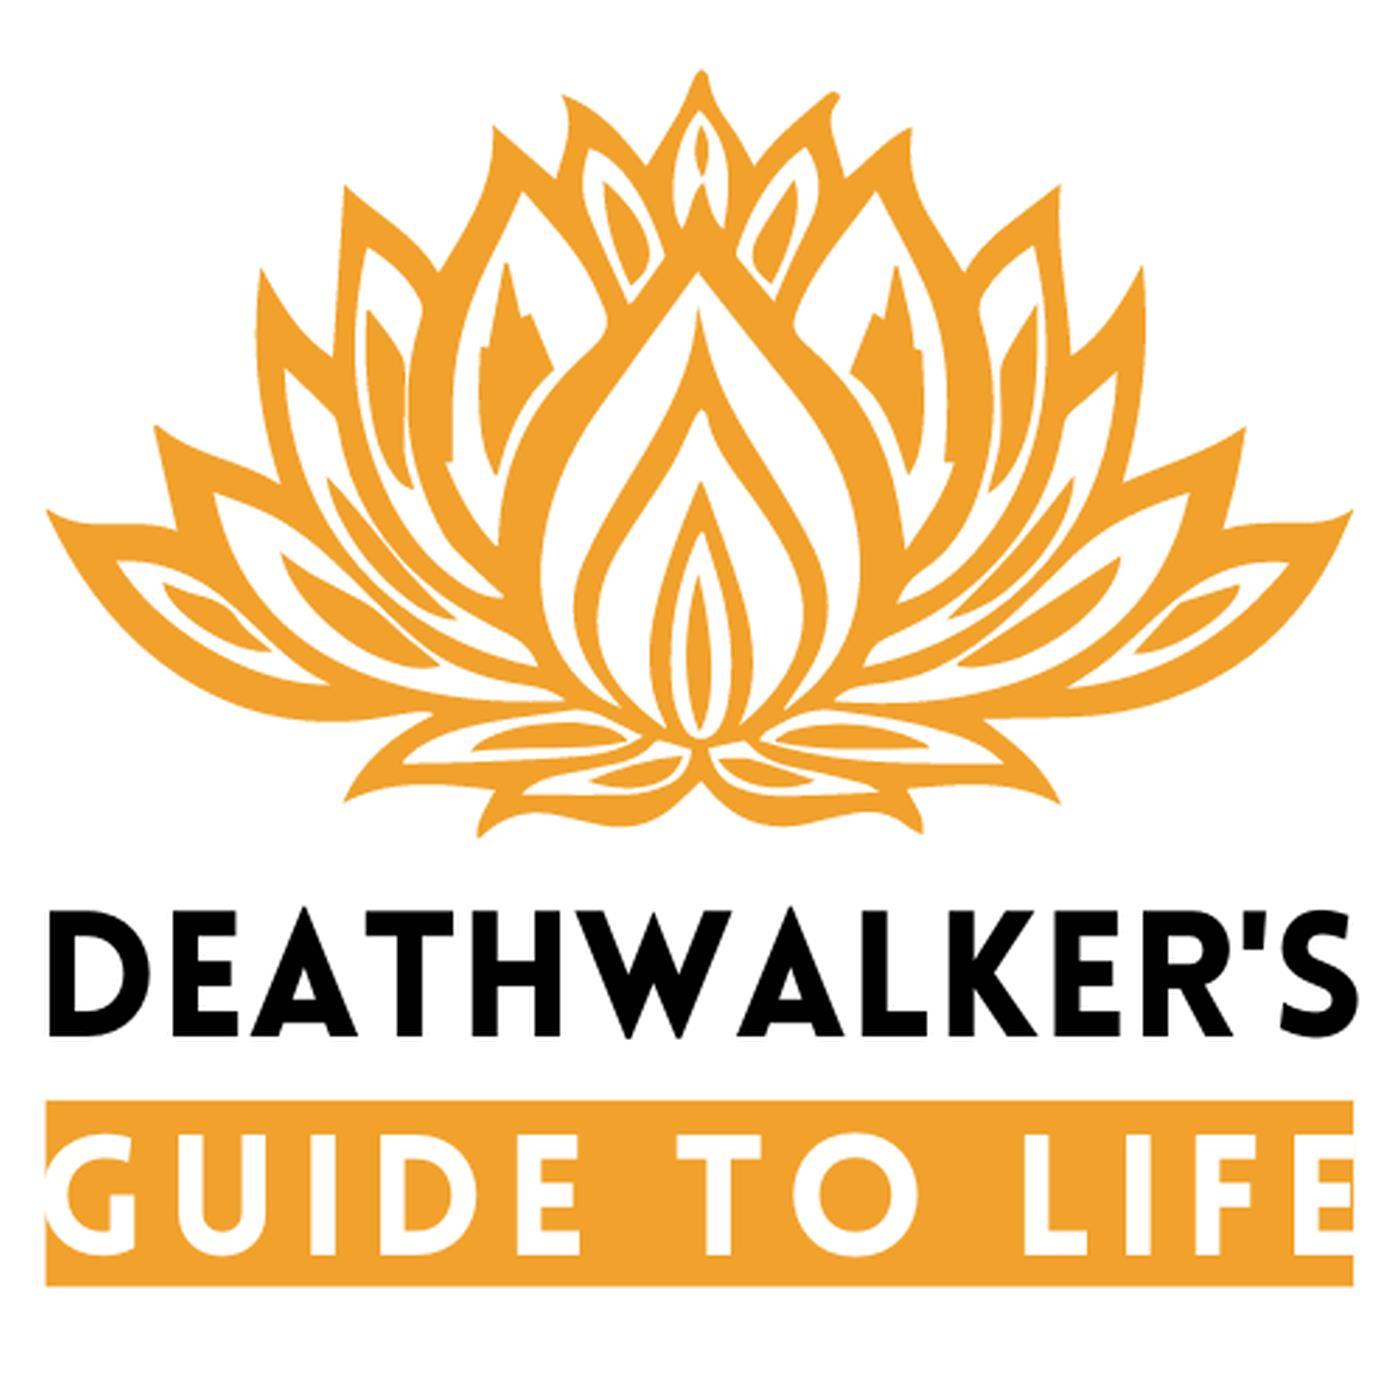 Deathwalker's Guide To Life